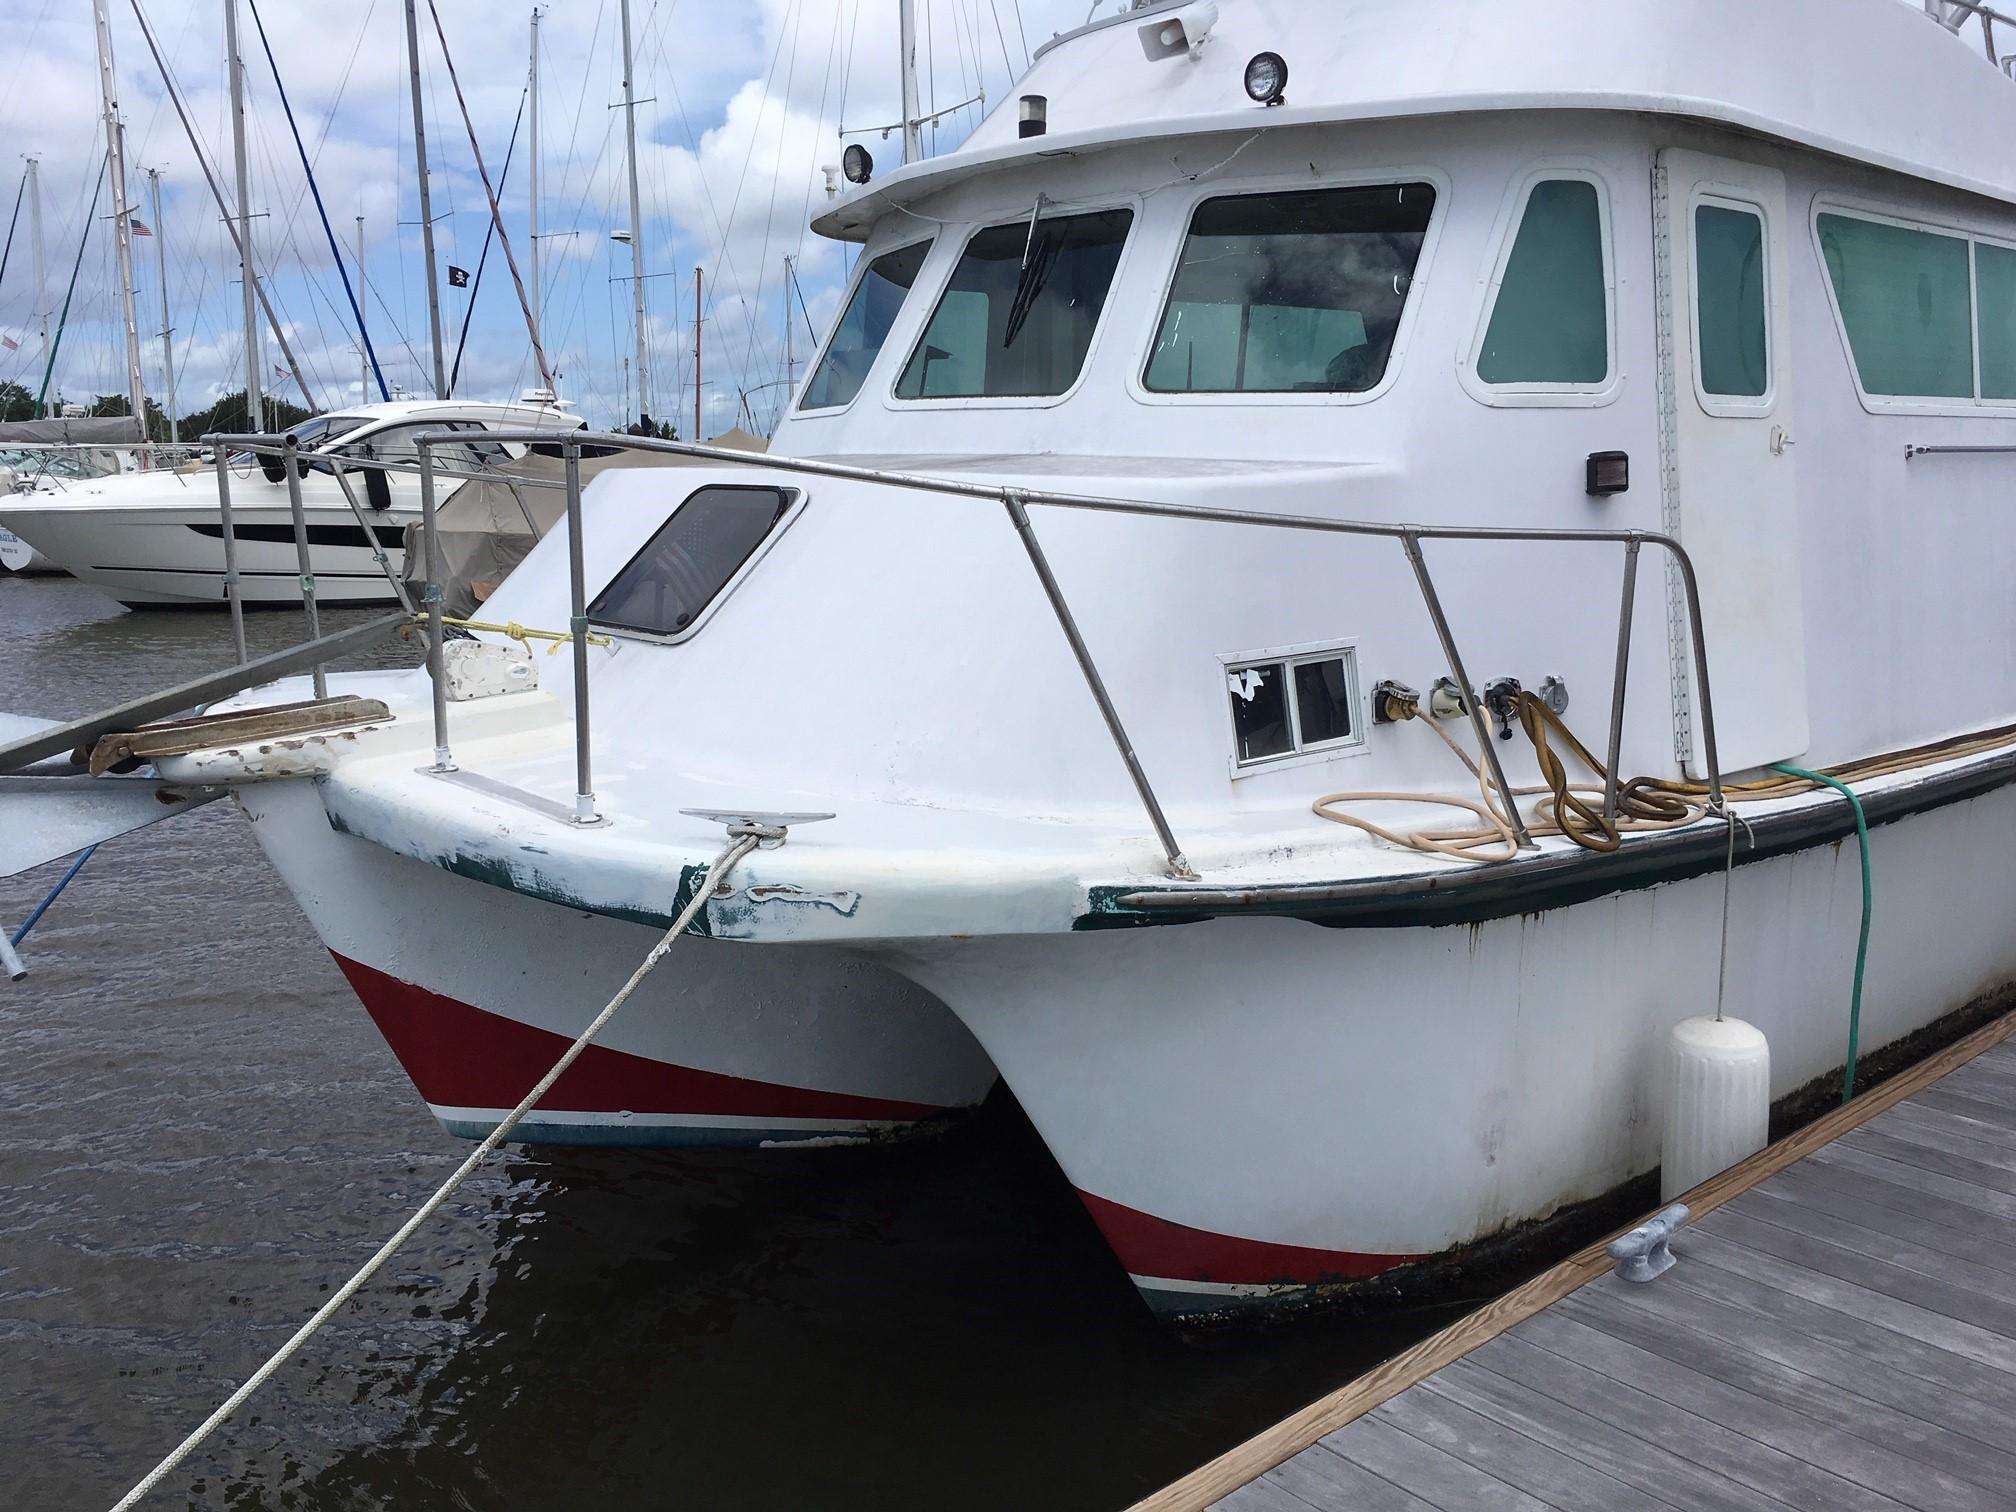 Carri-craft 57-ft Power Catamaran - power catmaran